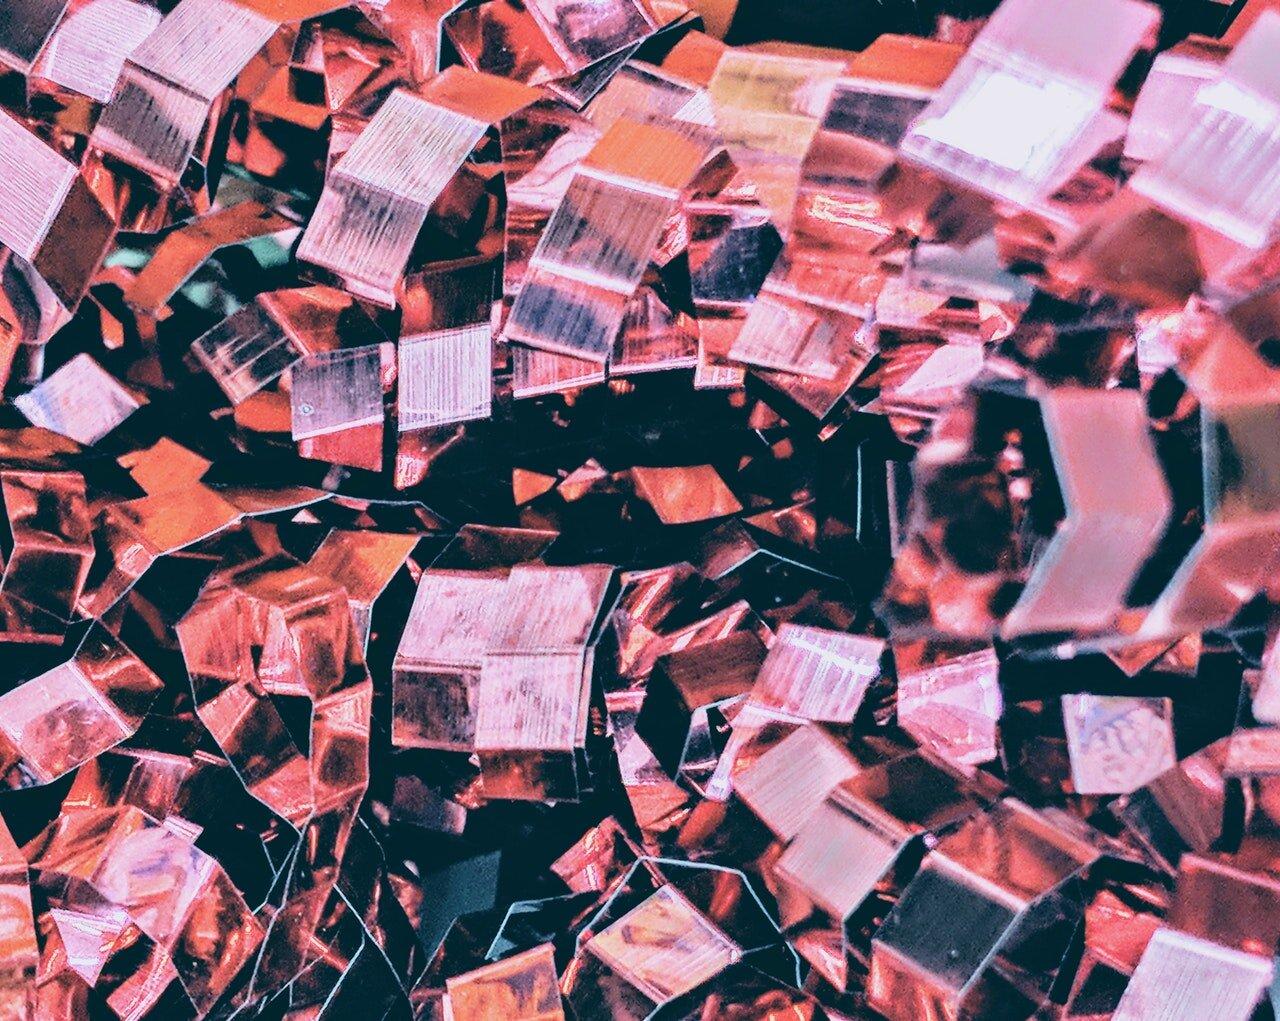 art-background-chaos-1098991.jpg